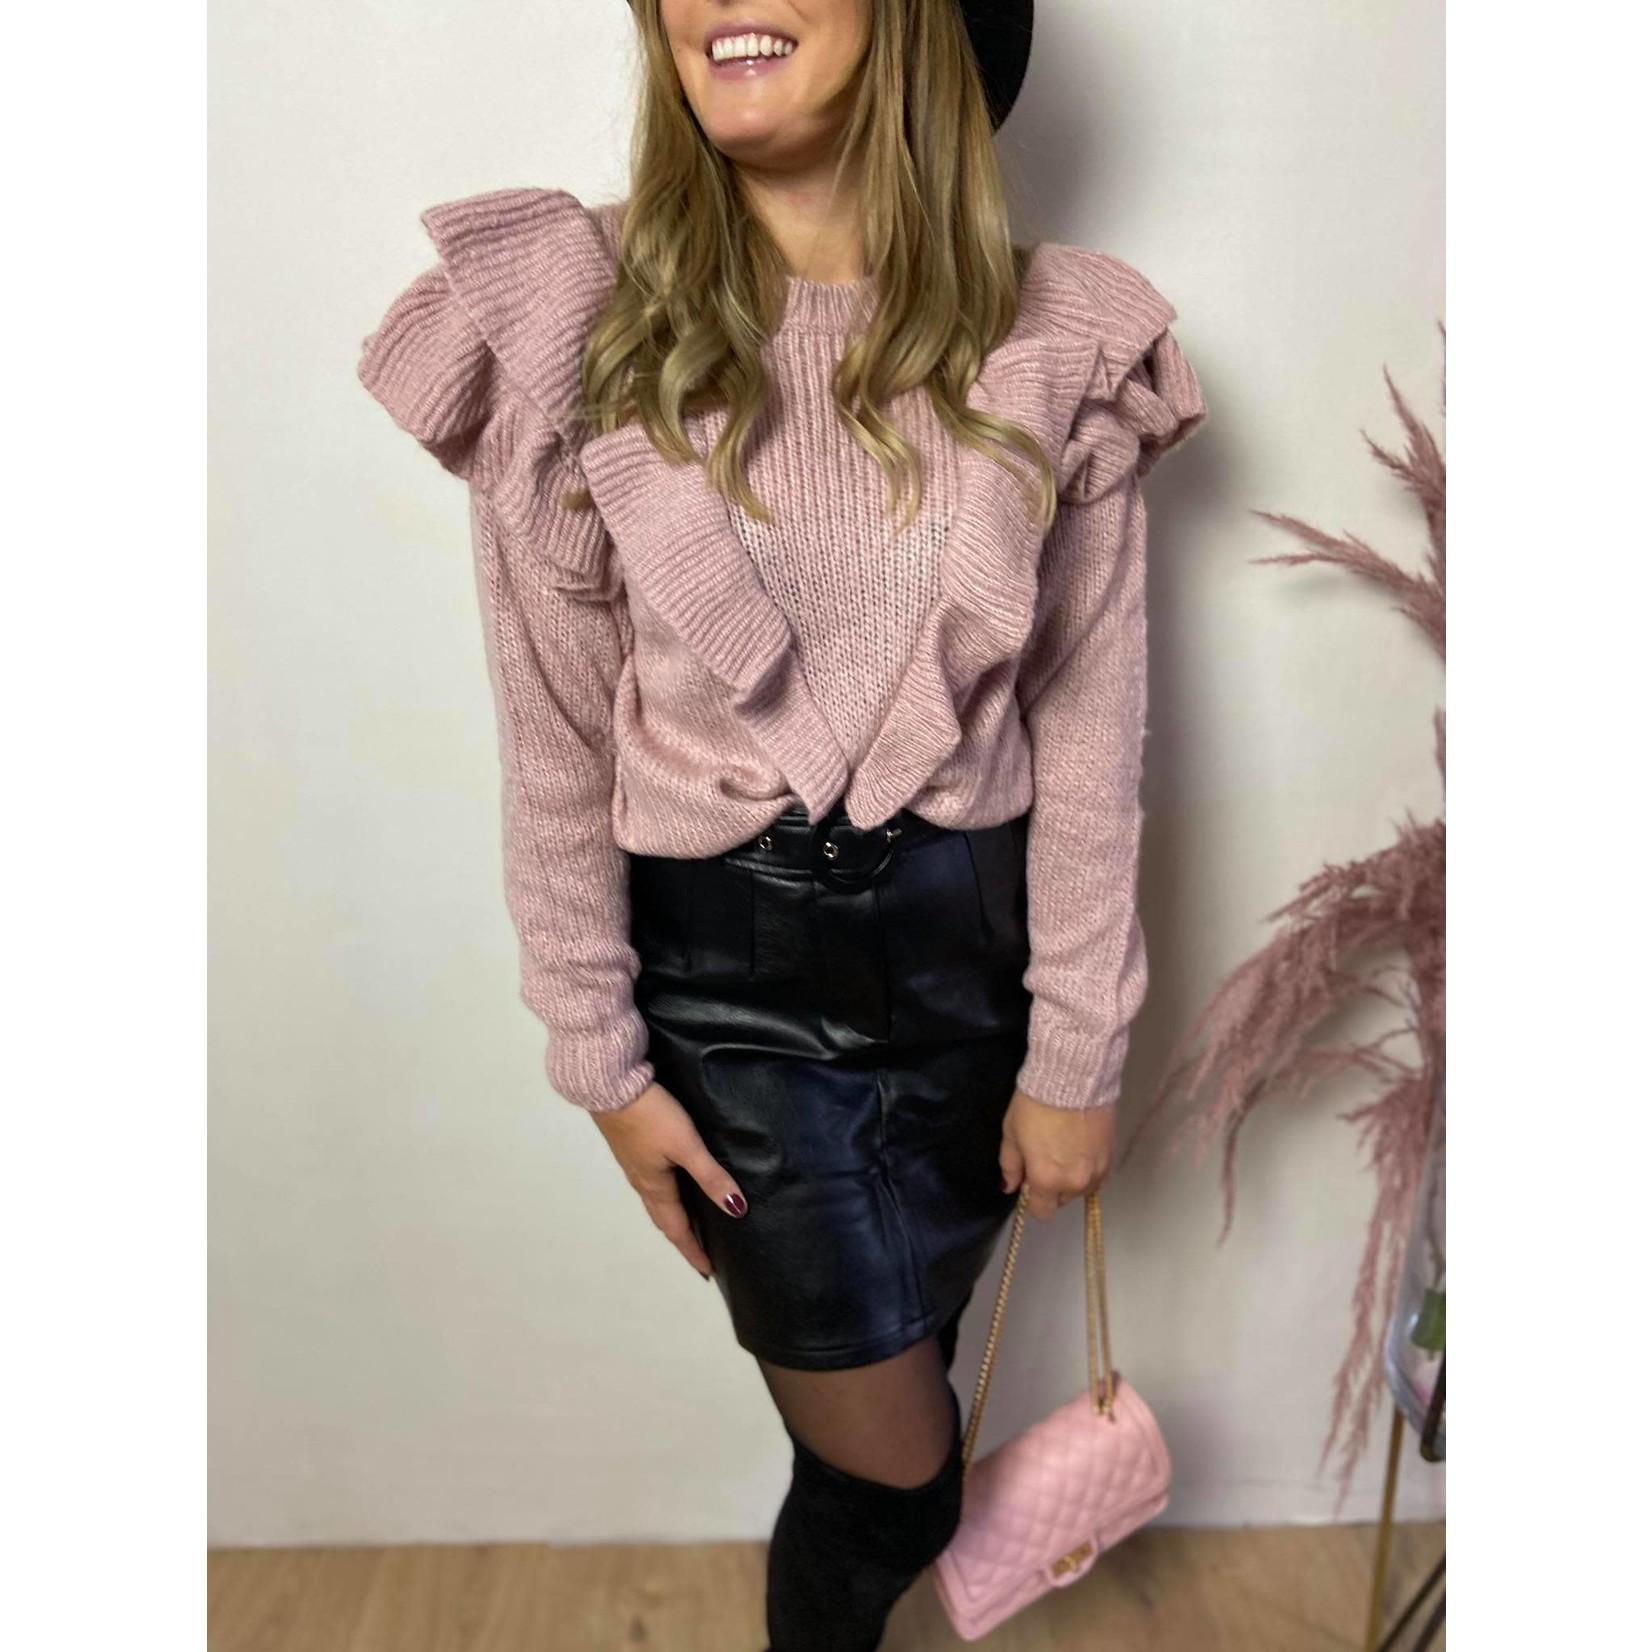 Skirt Salomé black pu leather